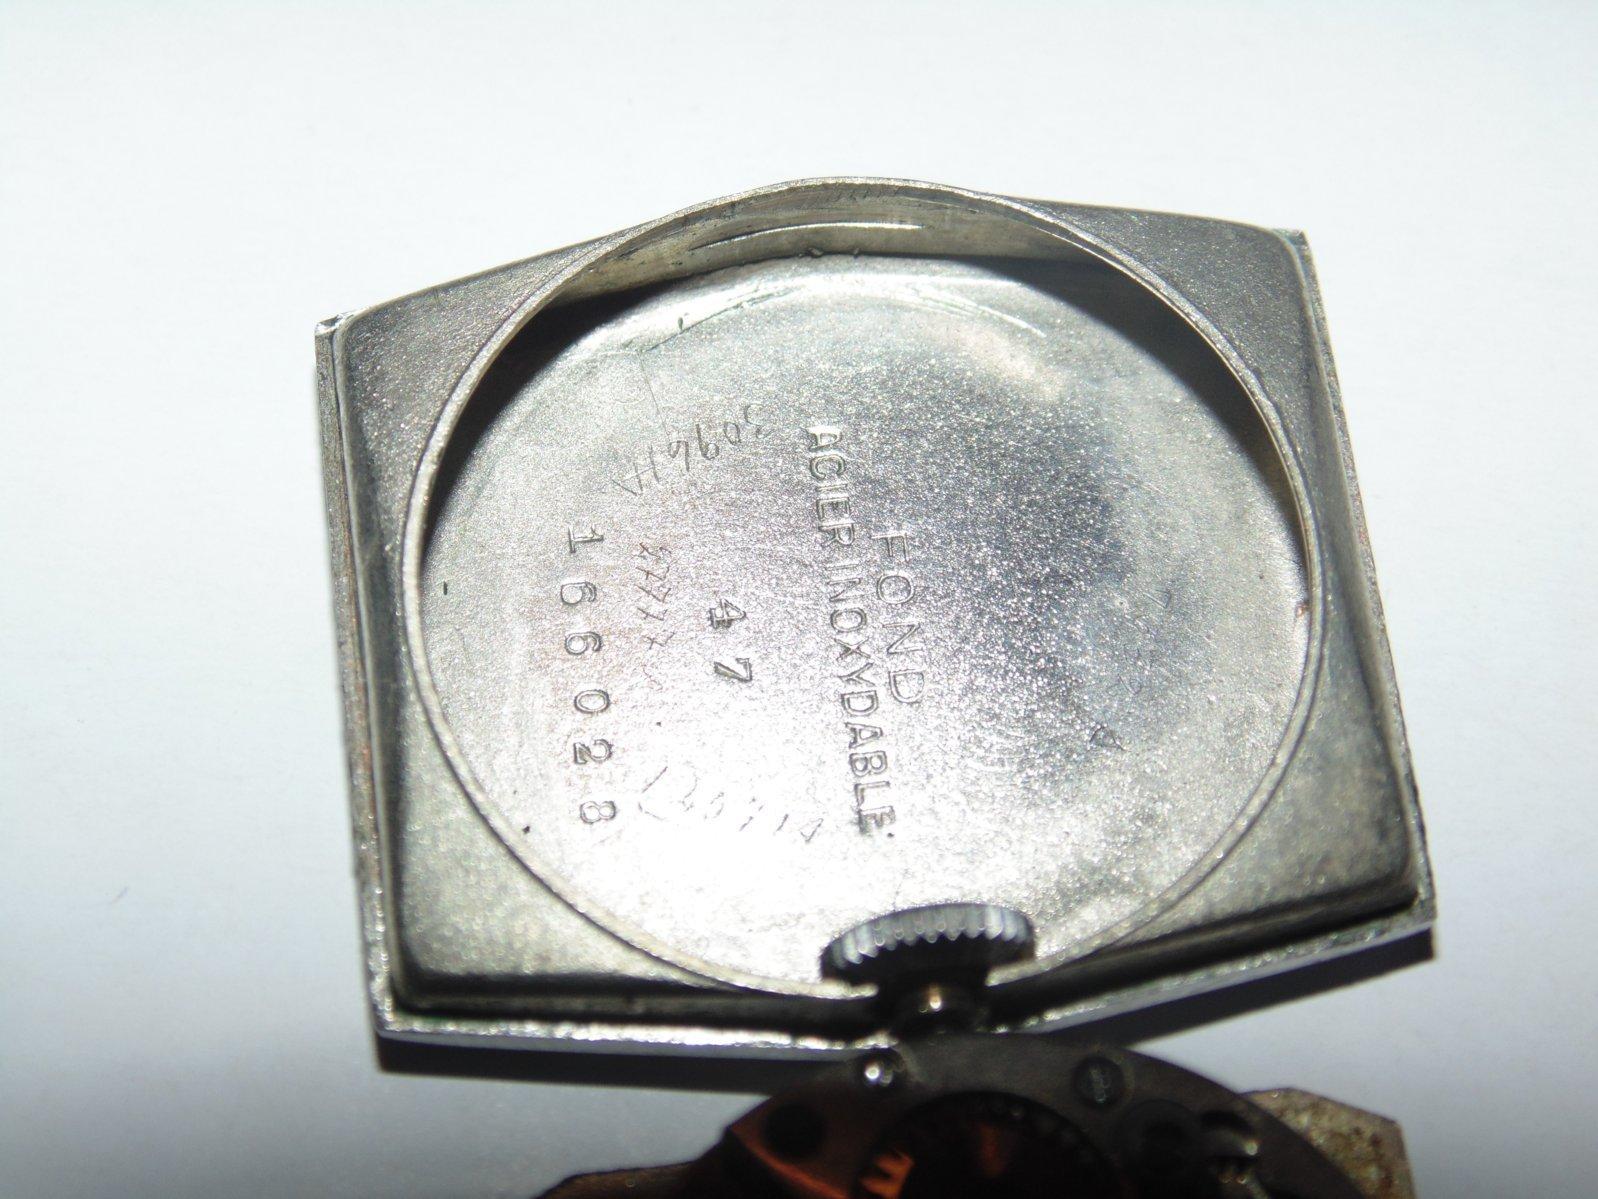 DSC01882.JPG